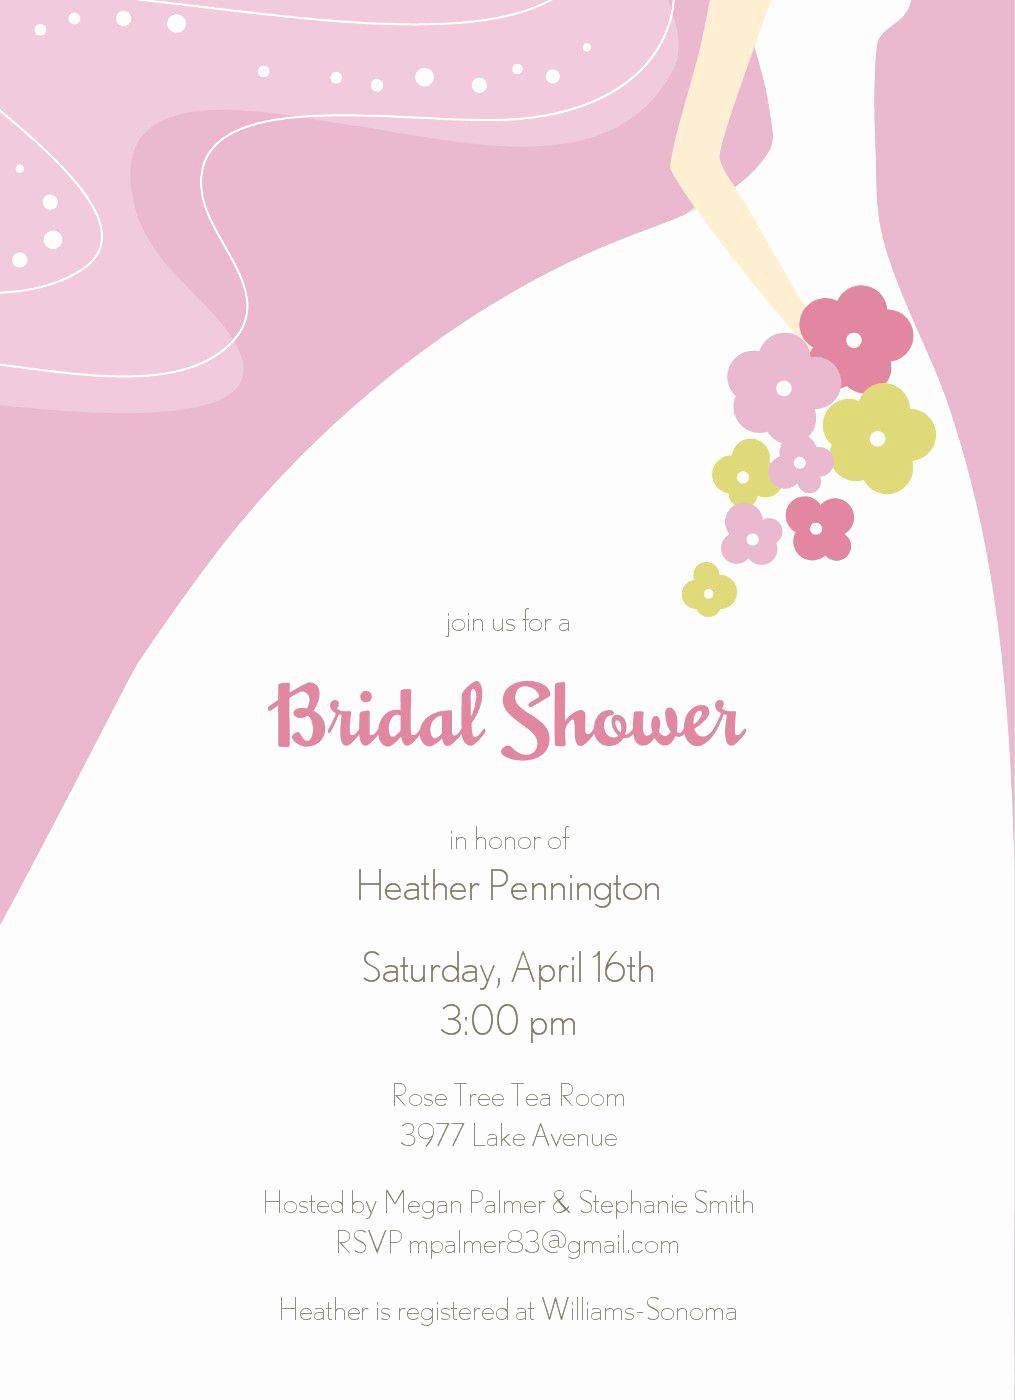 Free Bridal Shower Invitation Templates Elegant Angry Bird Invitations Templates Ideas Diy Angry Birds